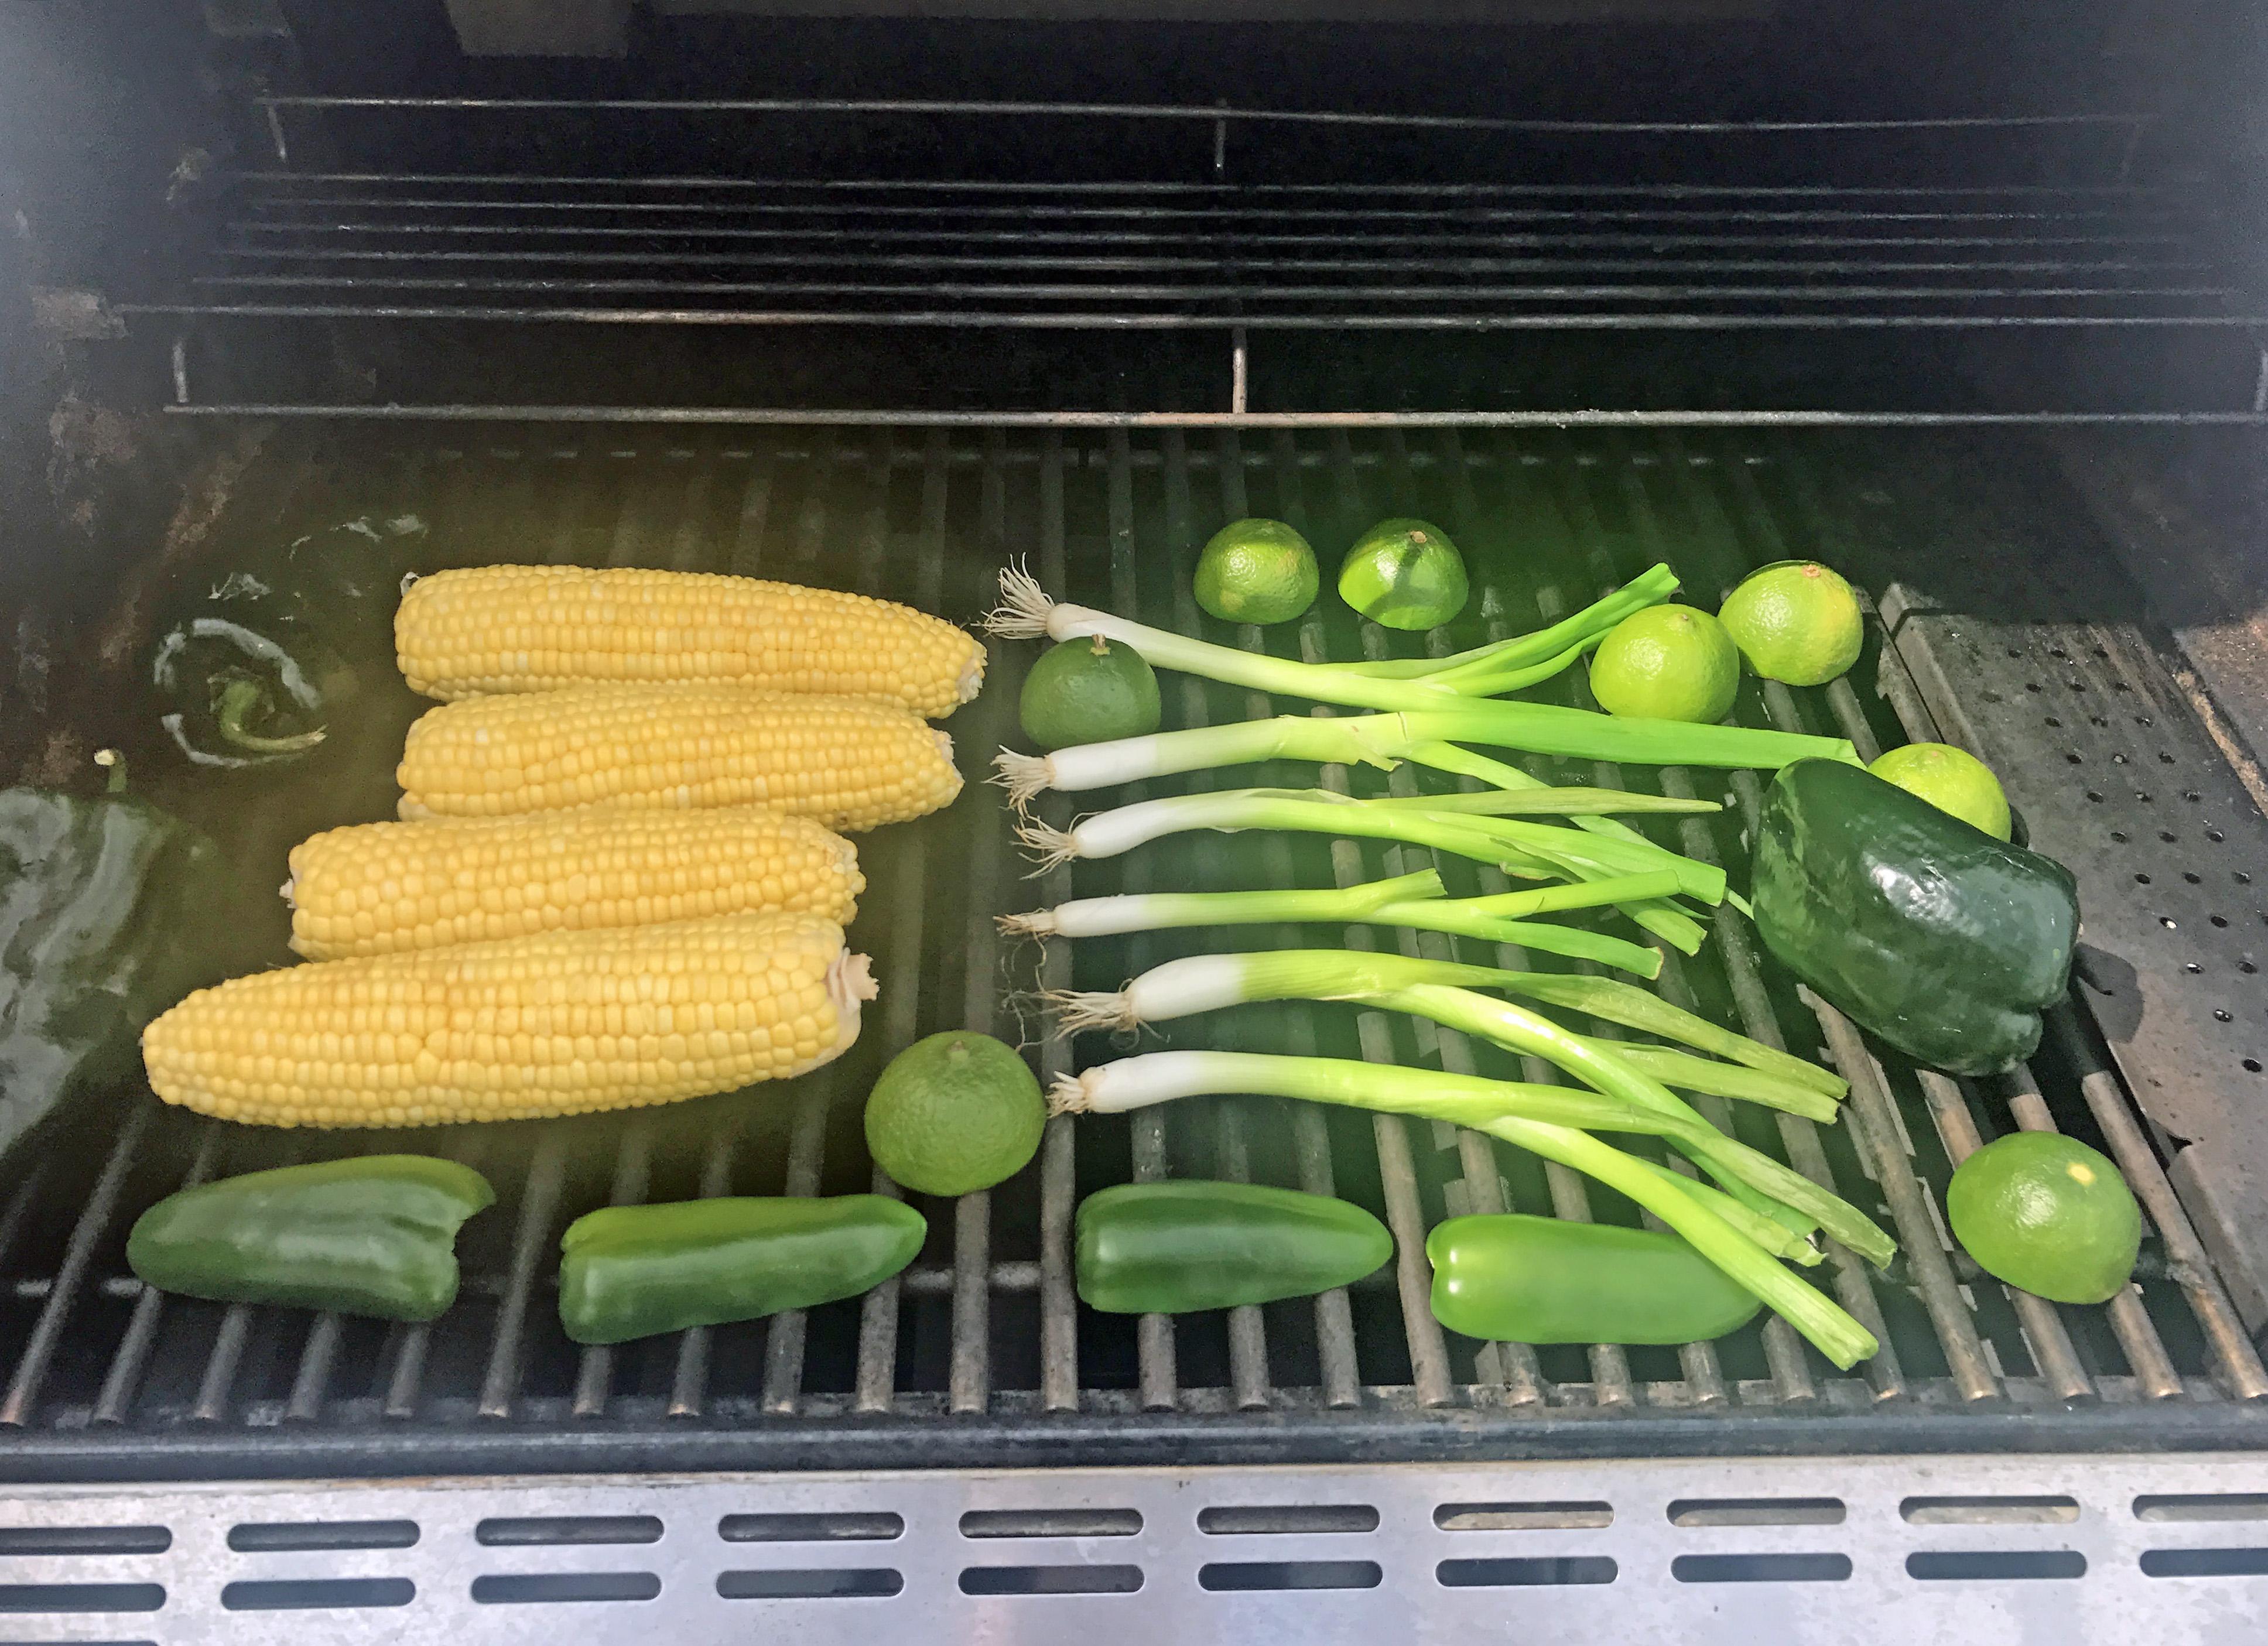 Corn Salad On the Grill